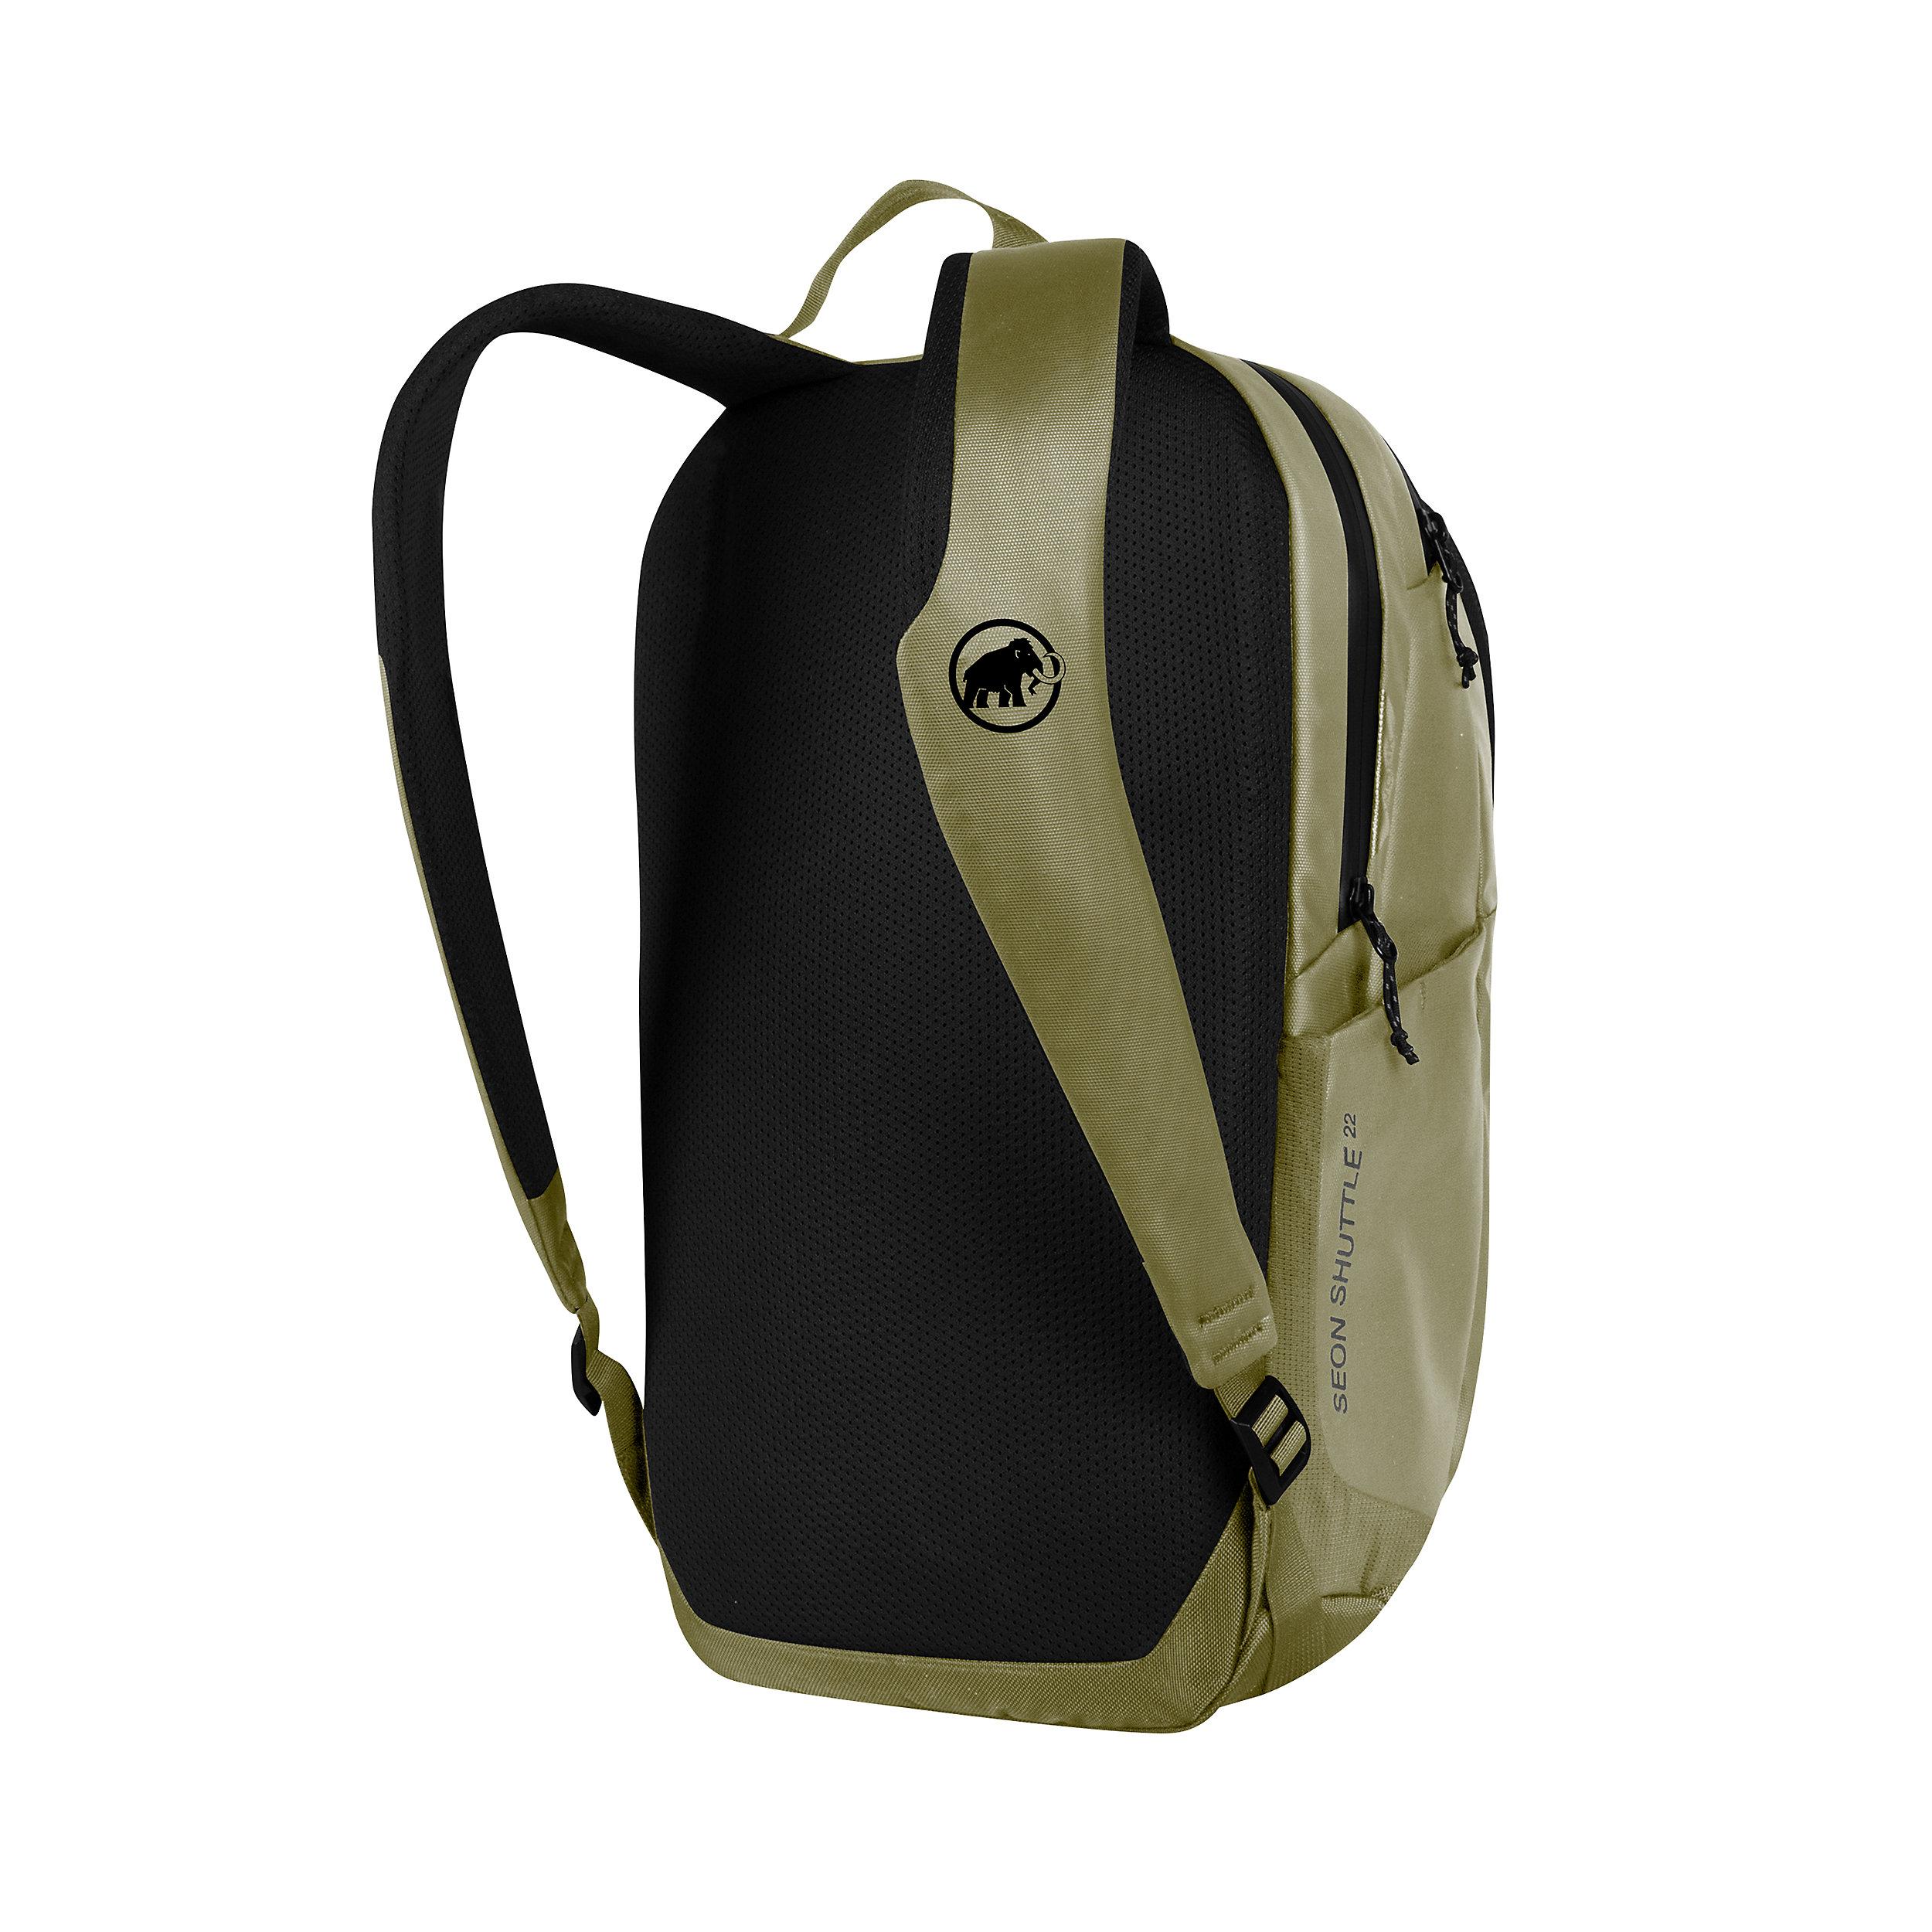 Backpack Seon Shuttle 15 Inch Seon 22 Liter